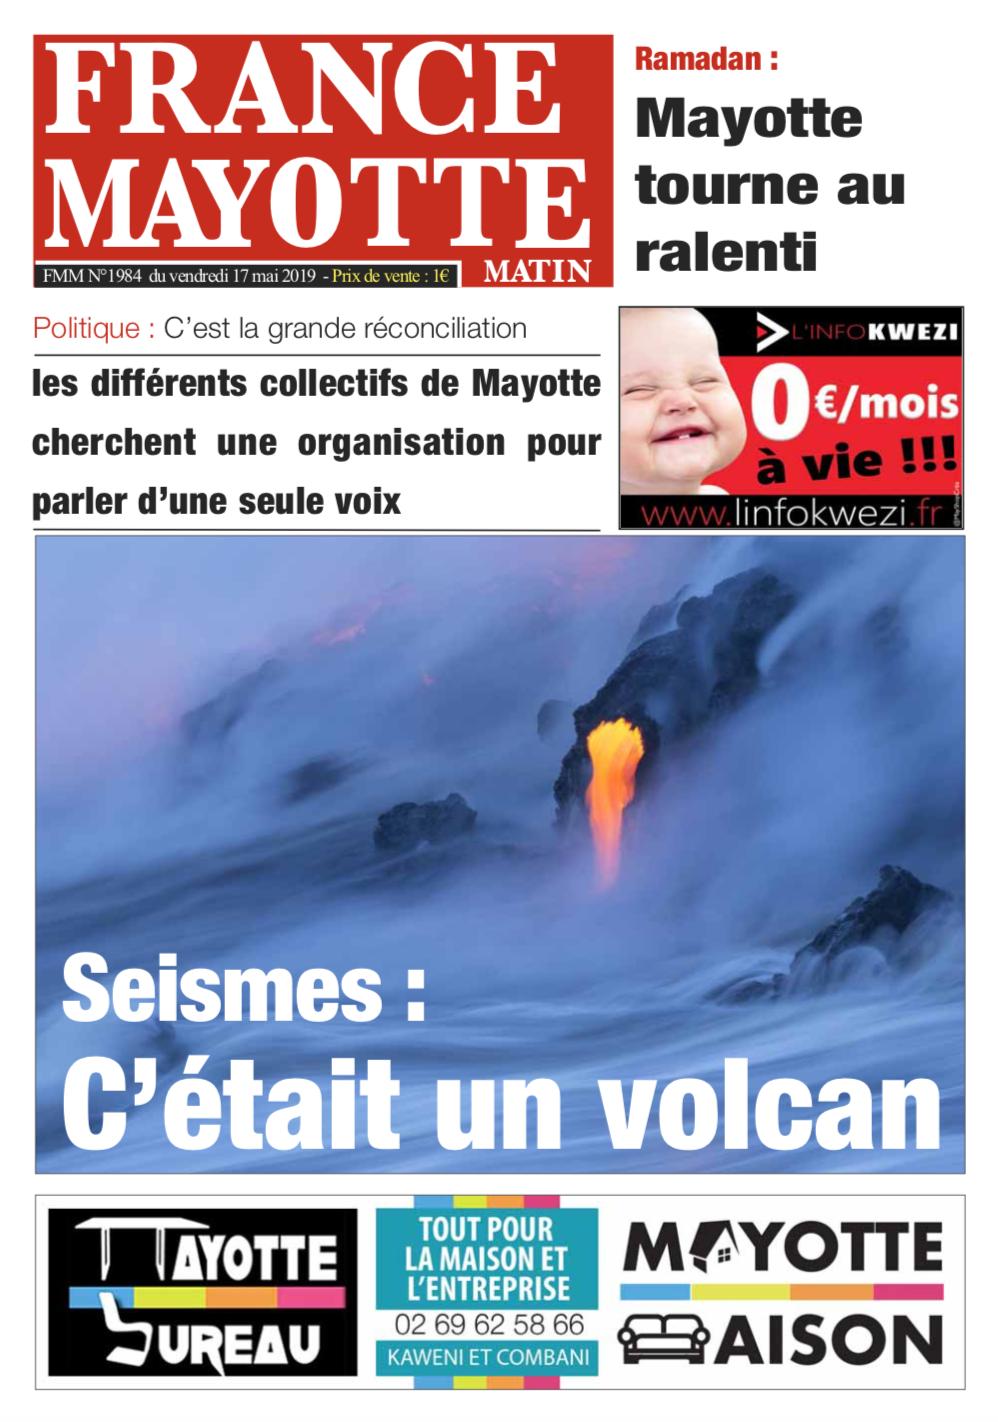 France Mayotte Vendredi 17 mai 2019